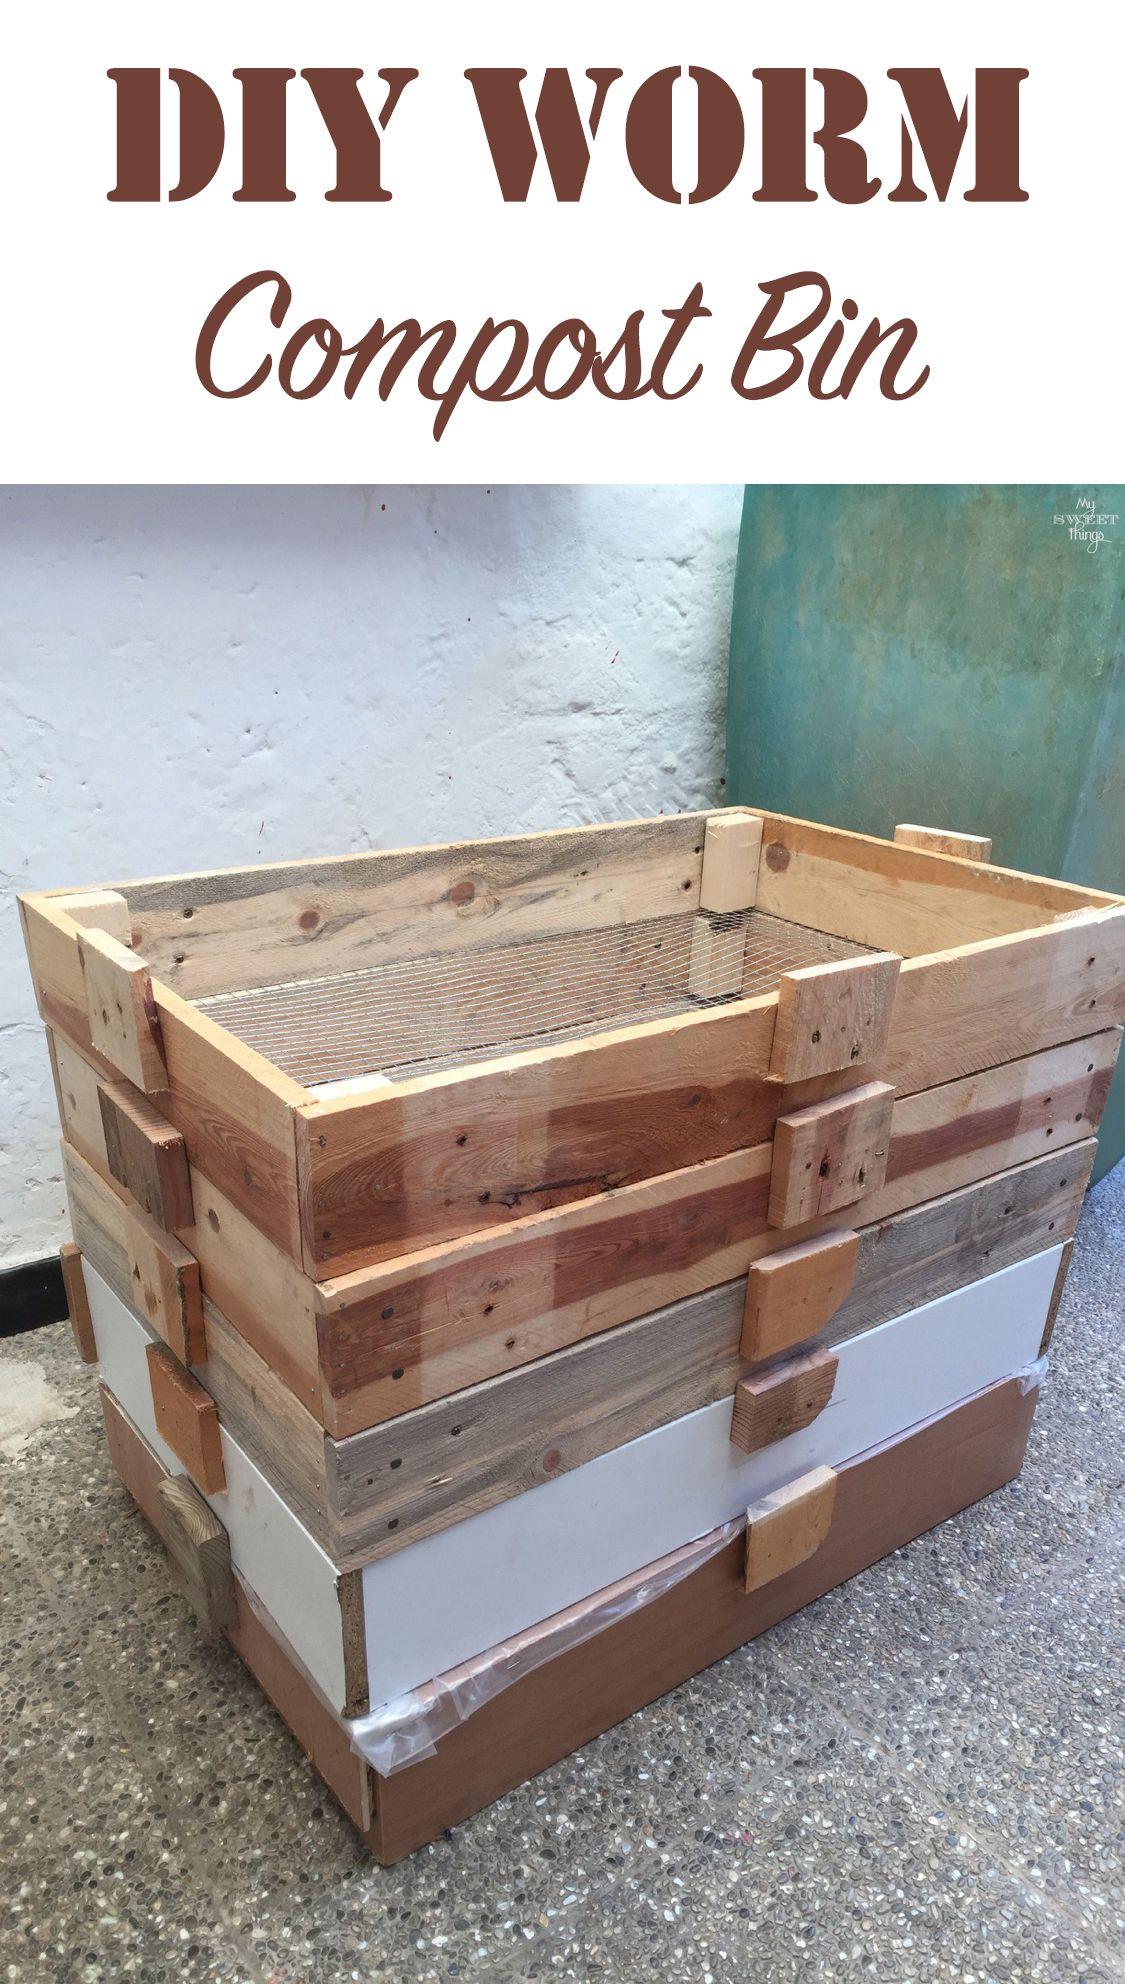 Diy Worm Compost Bin For Vermicomposting Pallet Wood